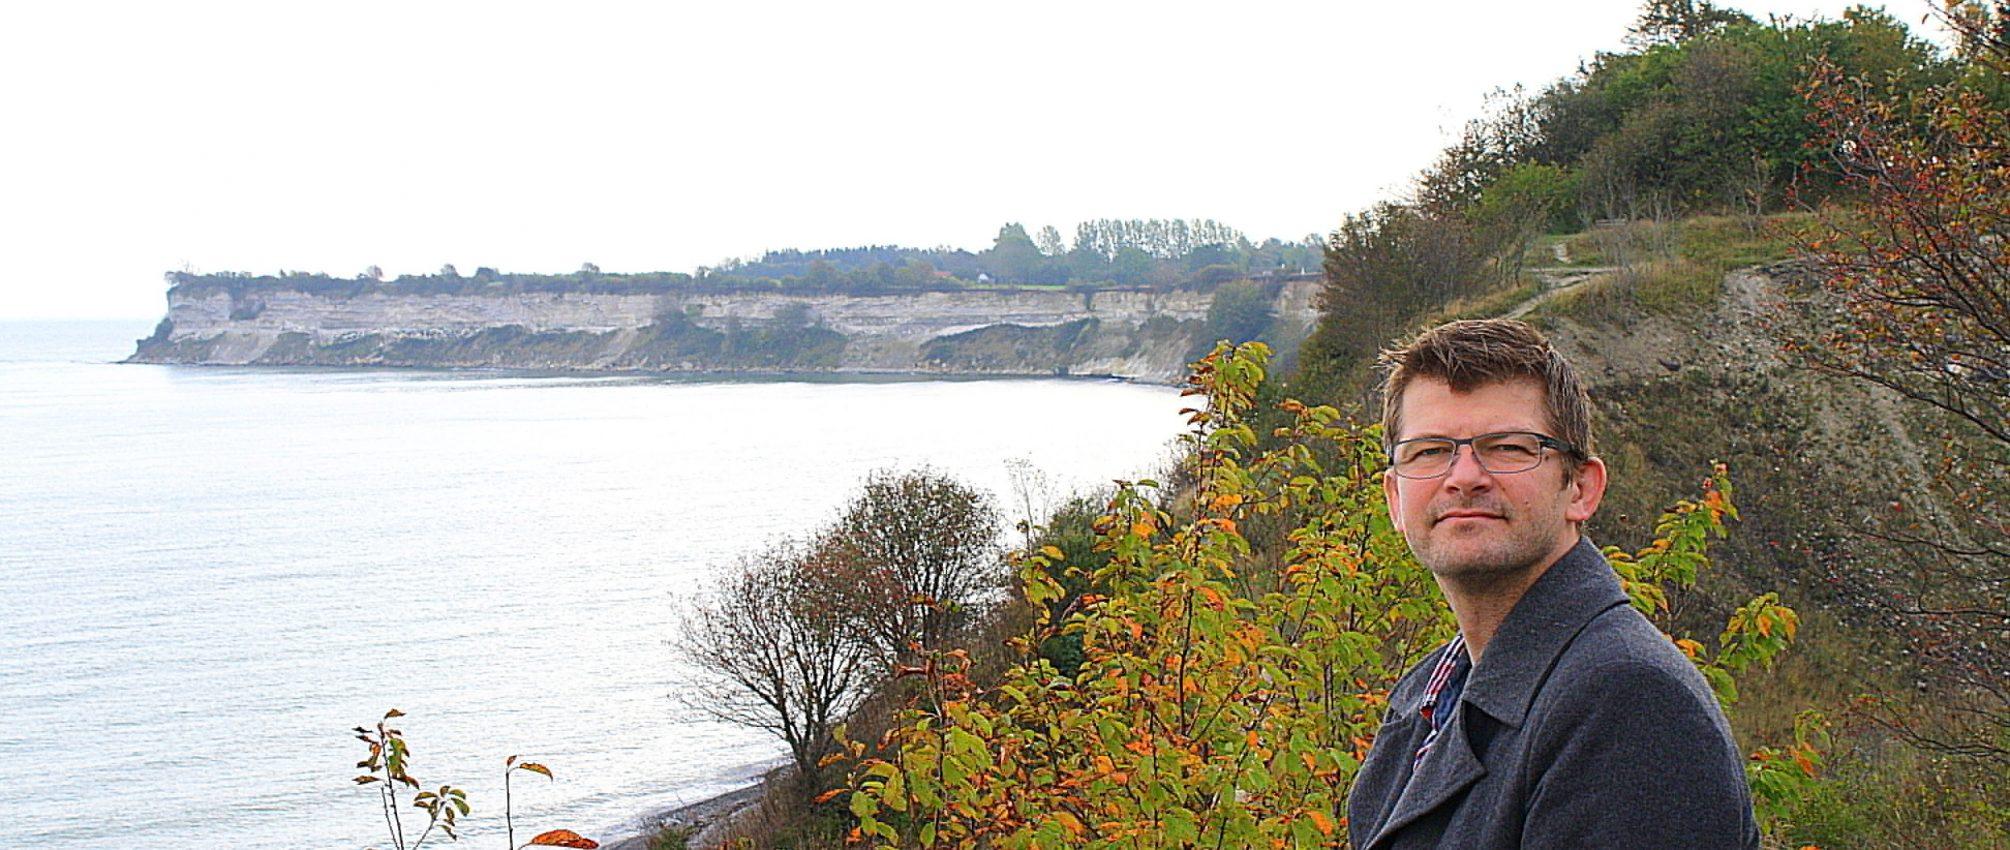 Psykoterapeut MPF Kim Matzen ved Stevns Klint